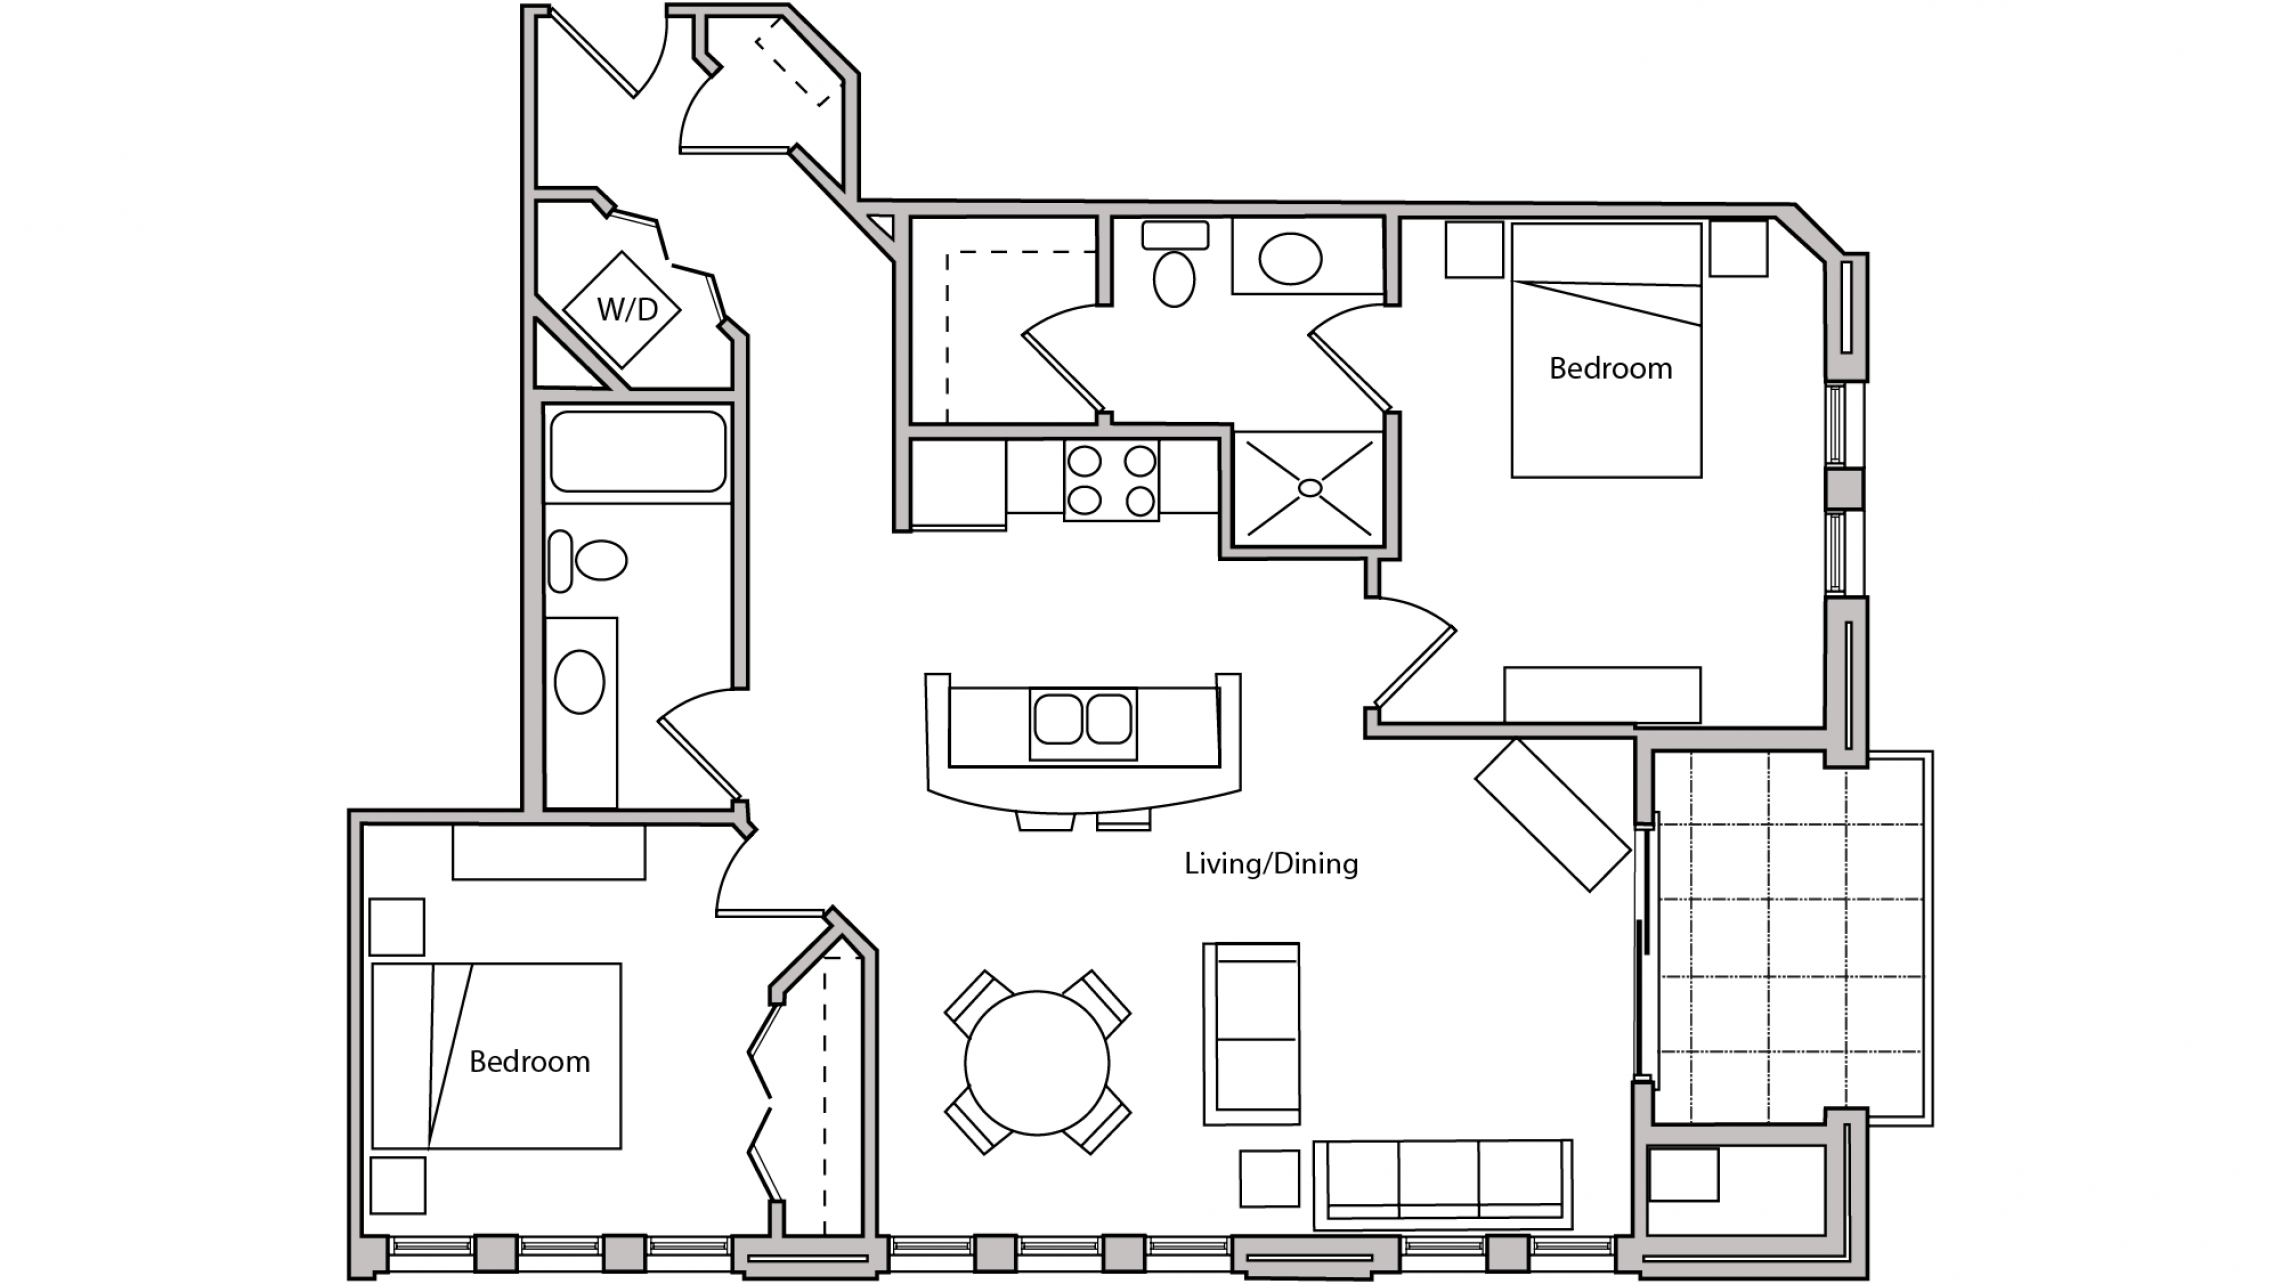 ULI The Depot 1-204 - Two Bedroom, Two Bathroom